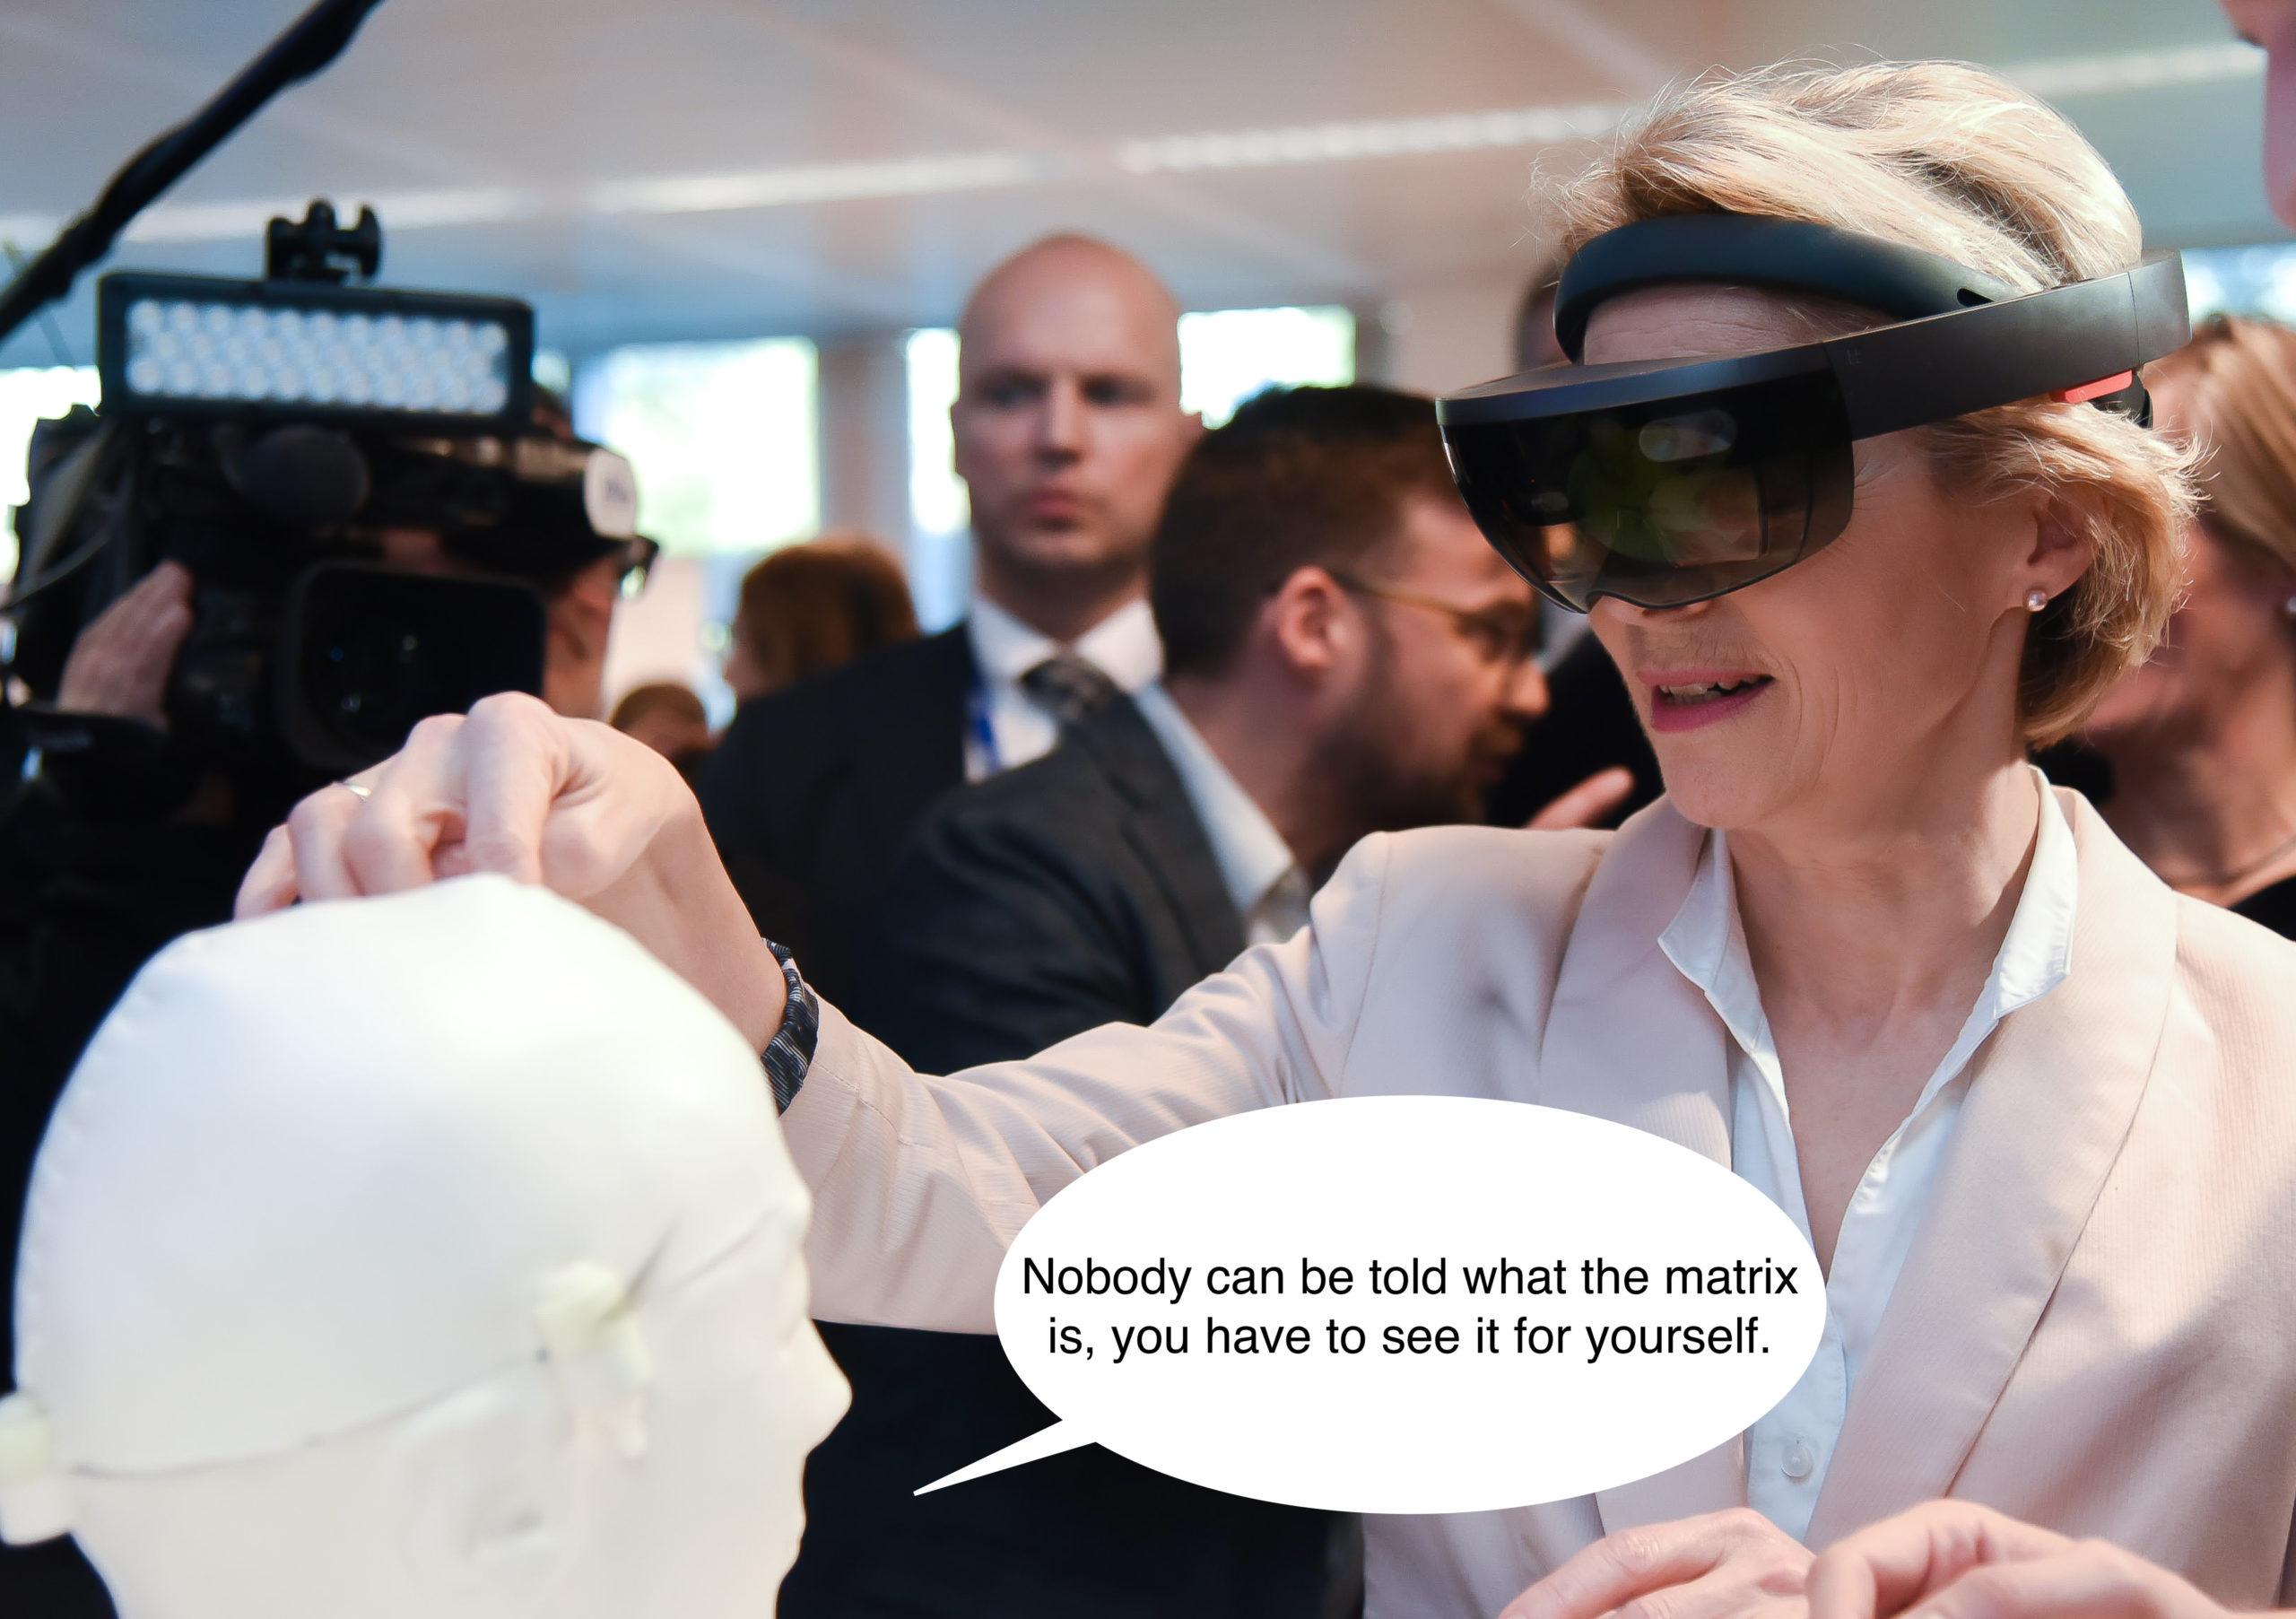 Neo EU Commission